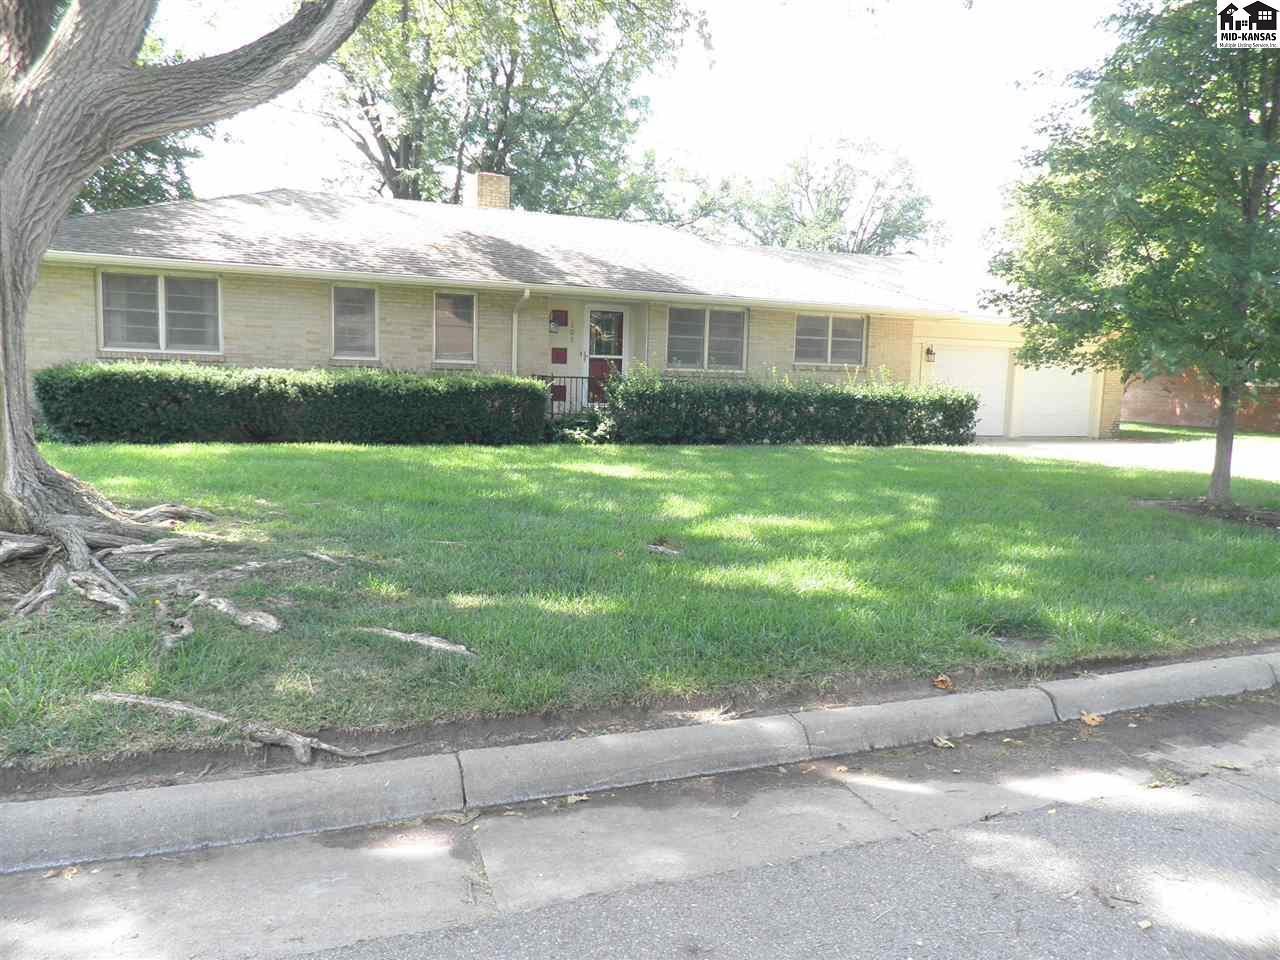 103 Downing Rd, Hutchinson, KS 67502